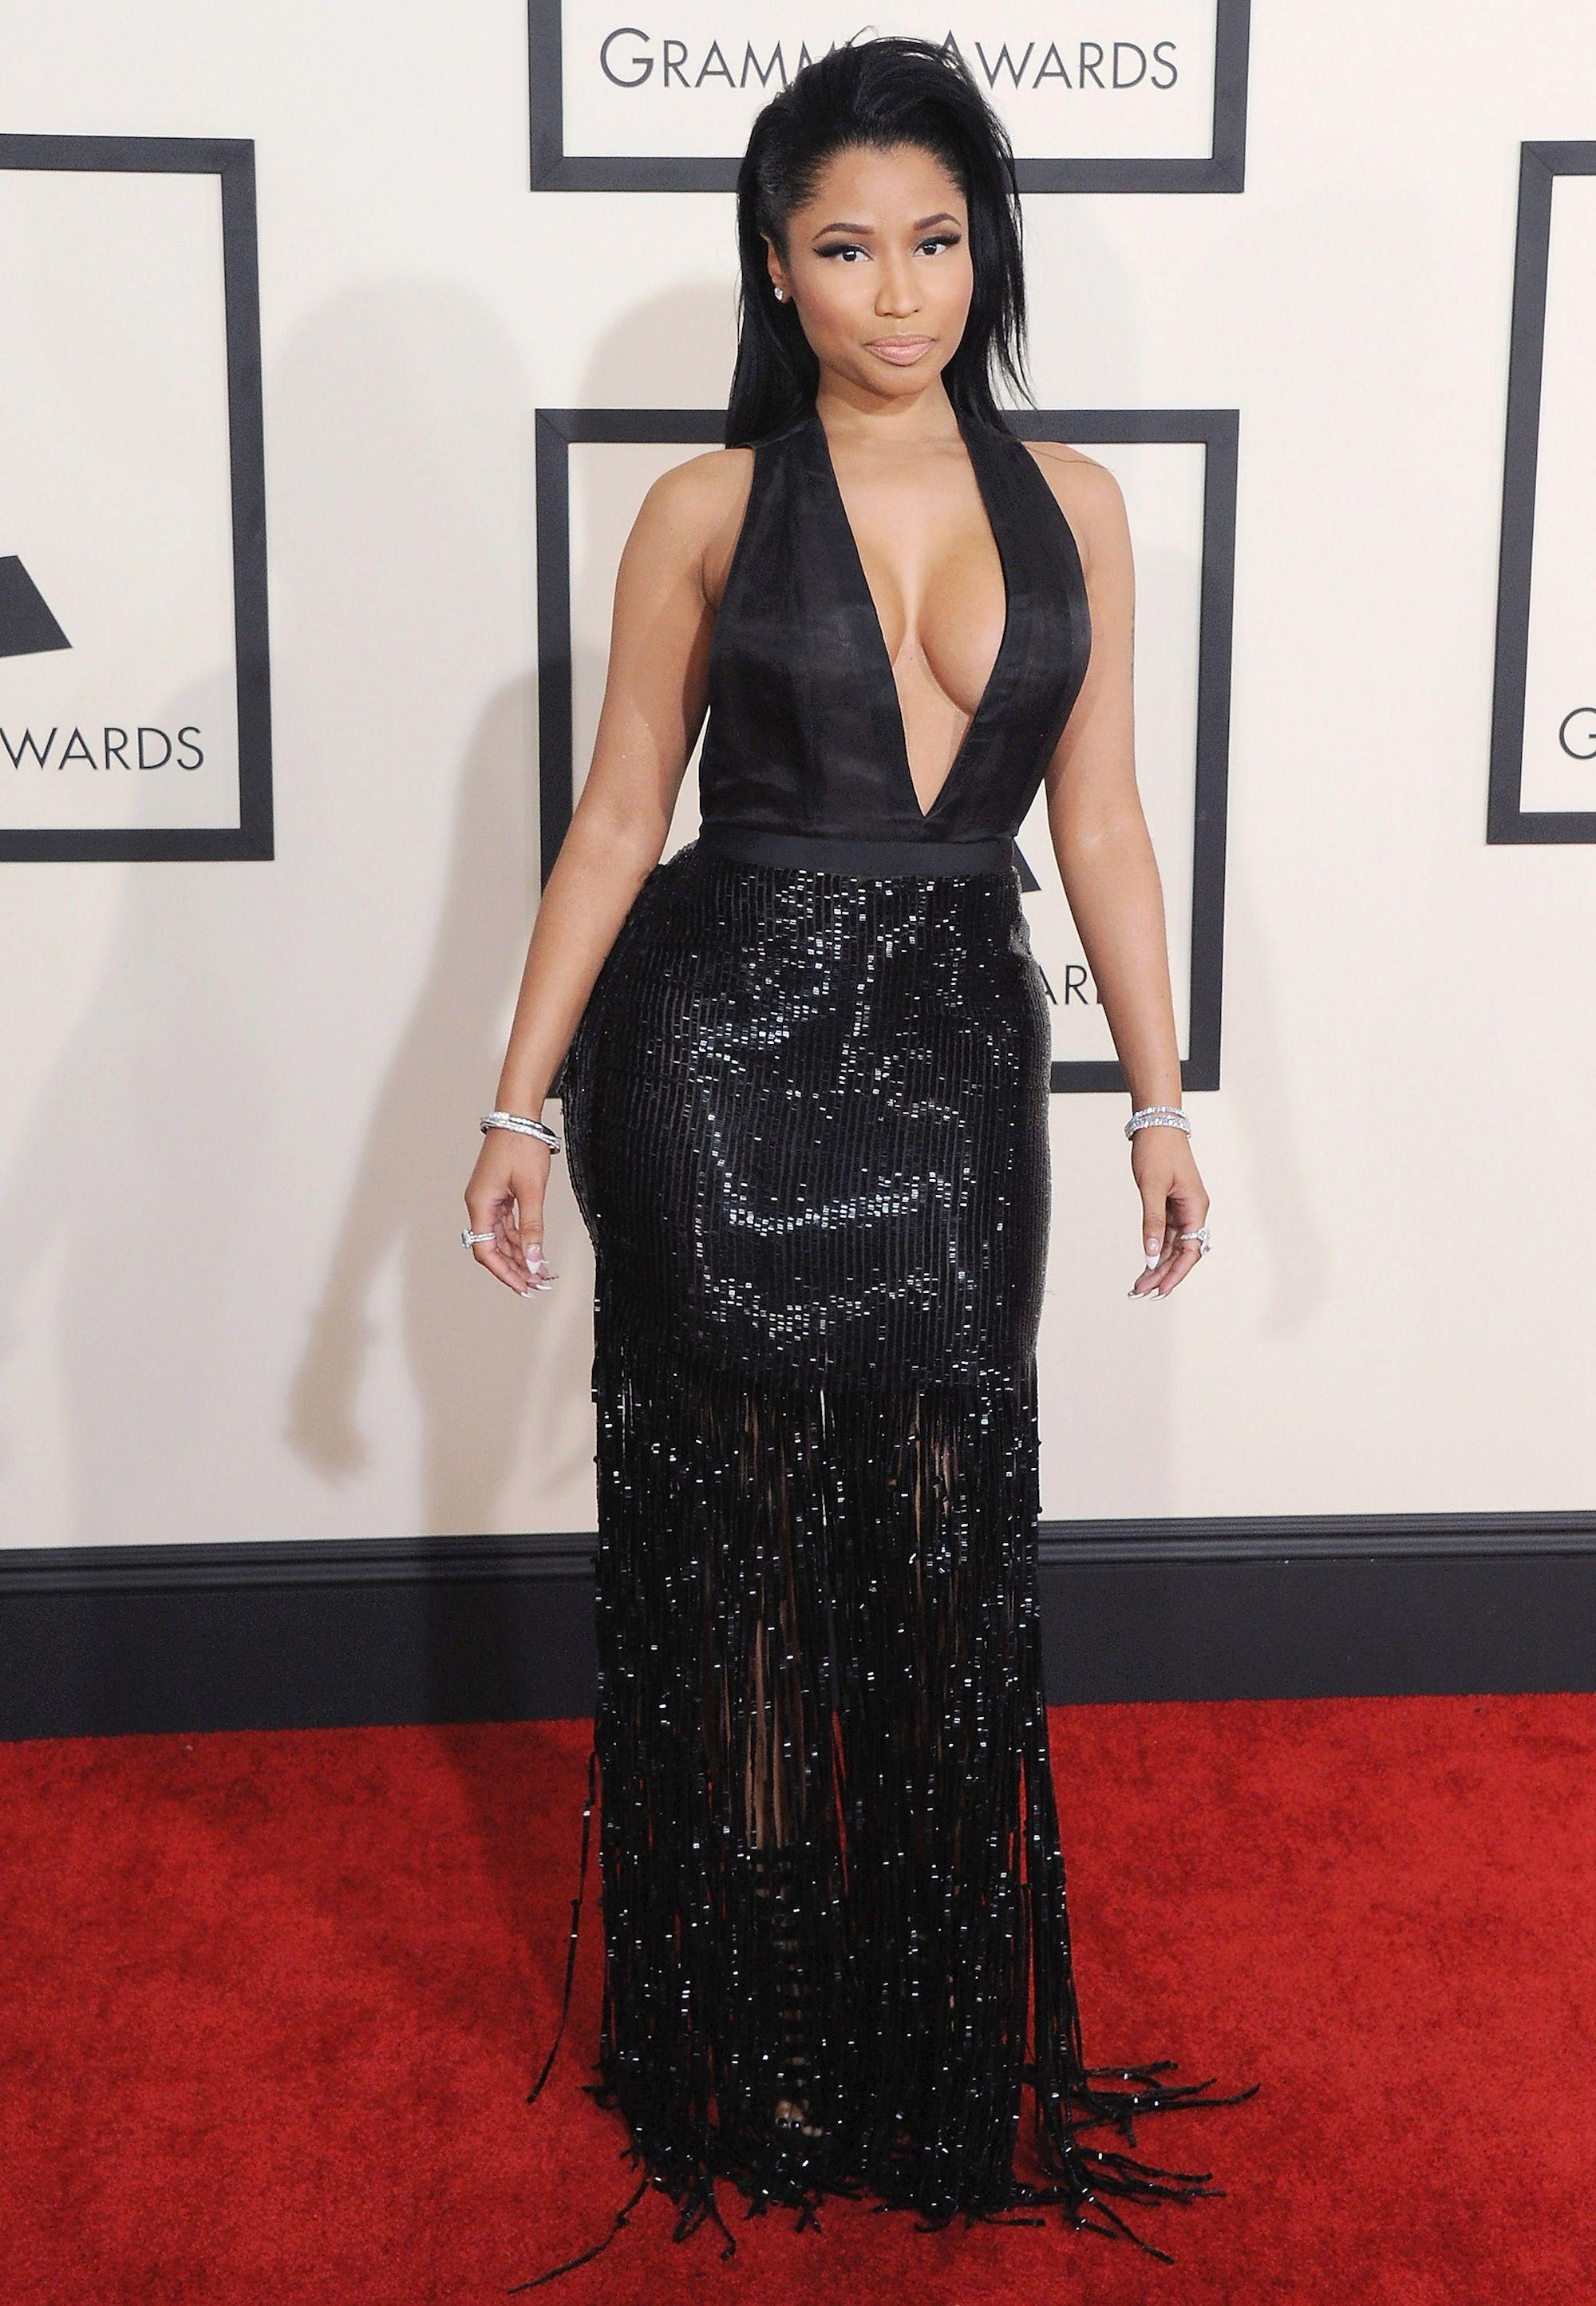 46723f7a72f Nicki Minaj on the red carpet at the Grammy Awards on Feb. 8